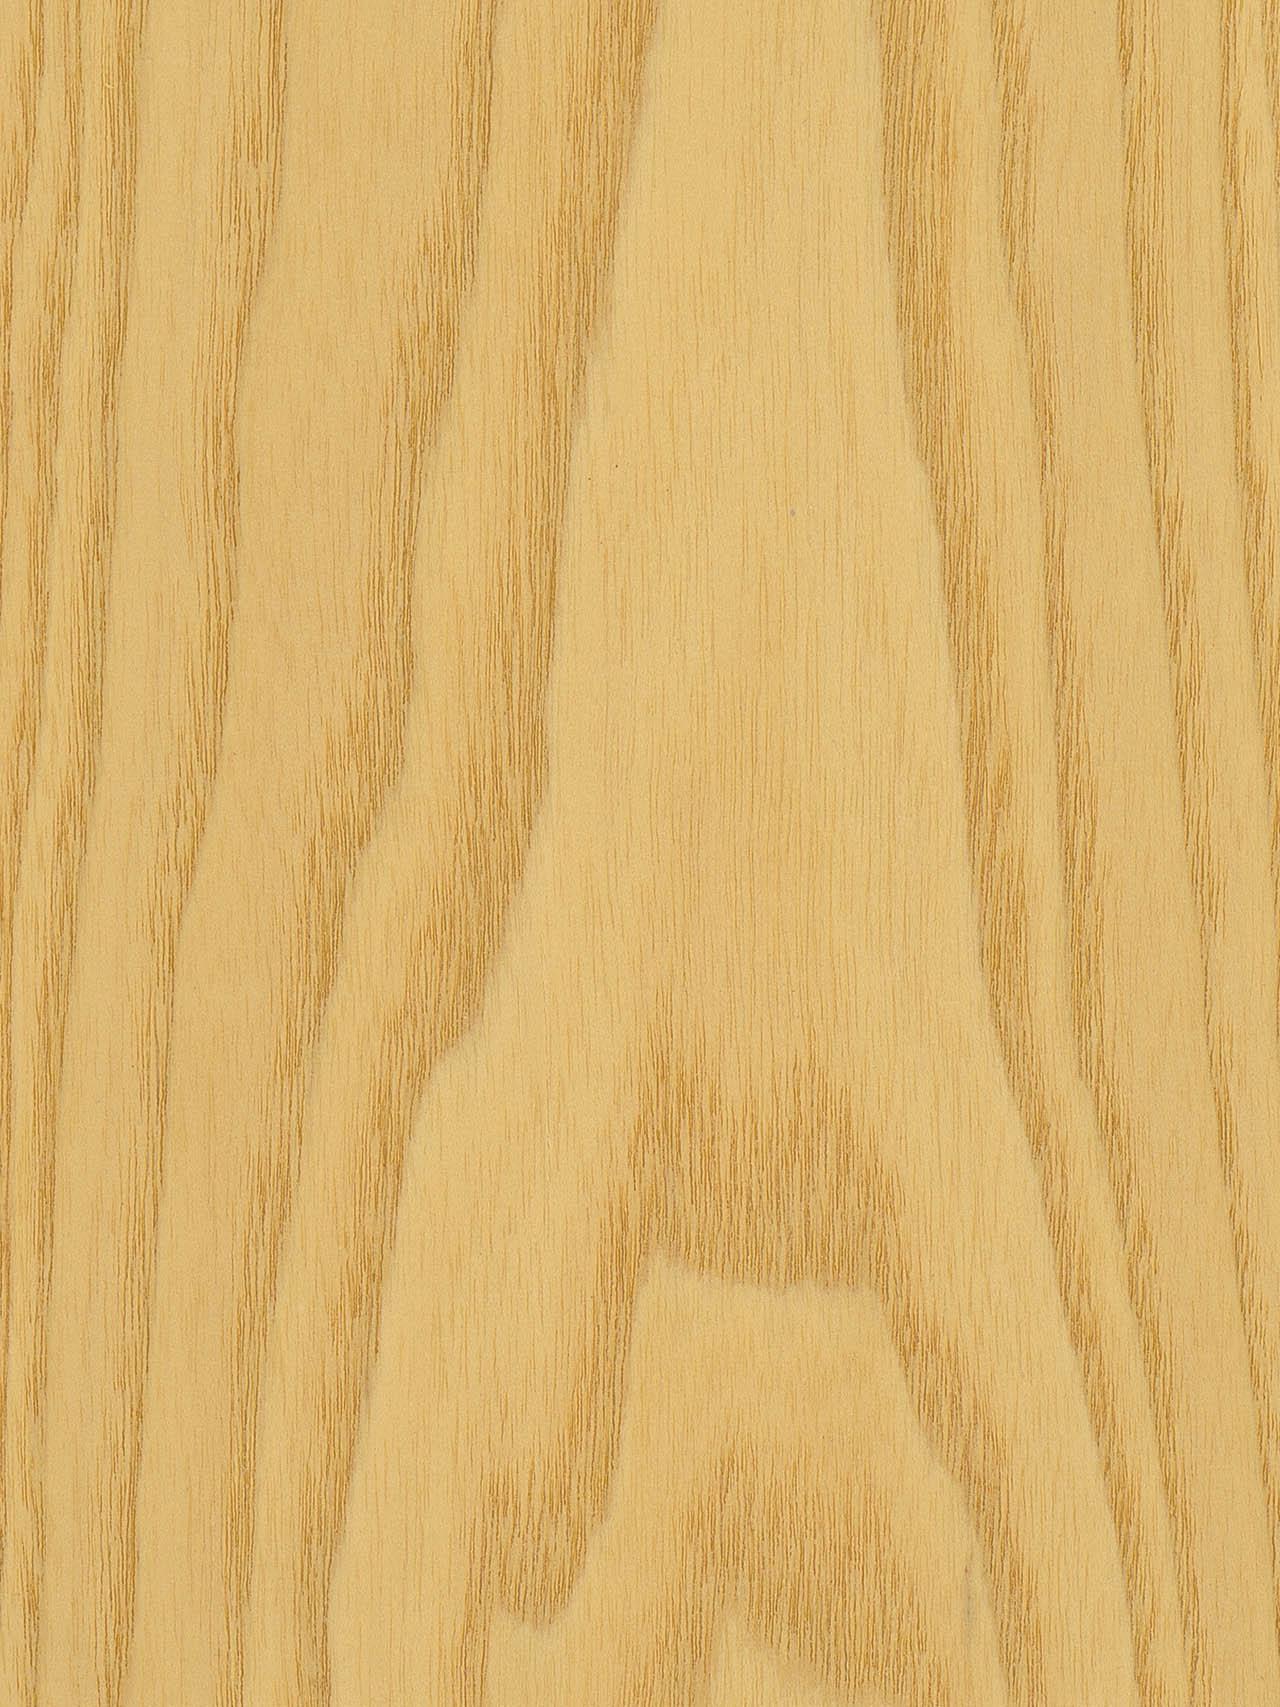 Chapa madera Fresno Trigo ABF 101 Losán